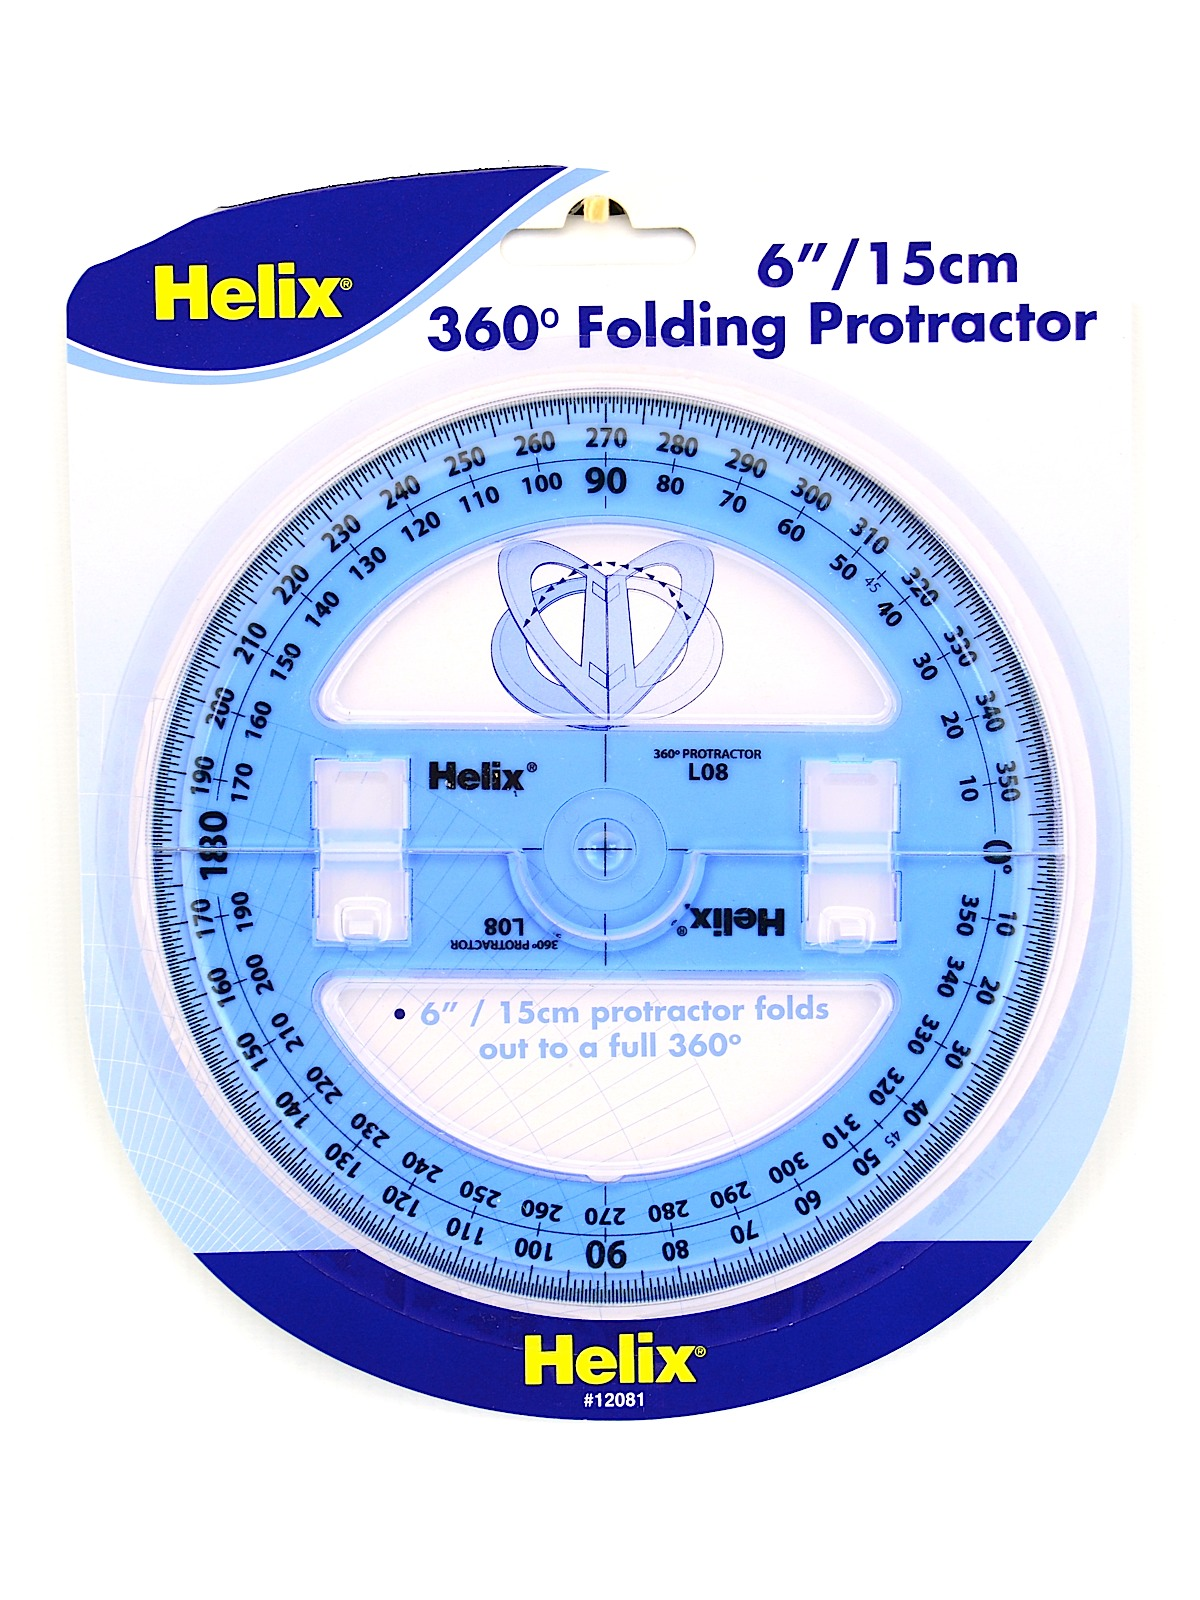 360 Folding Protractor 6